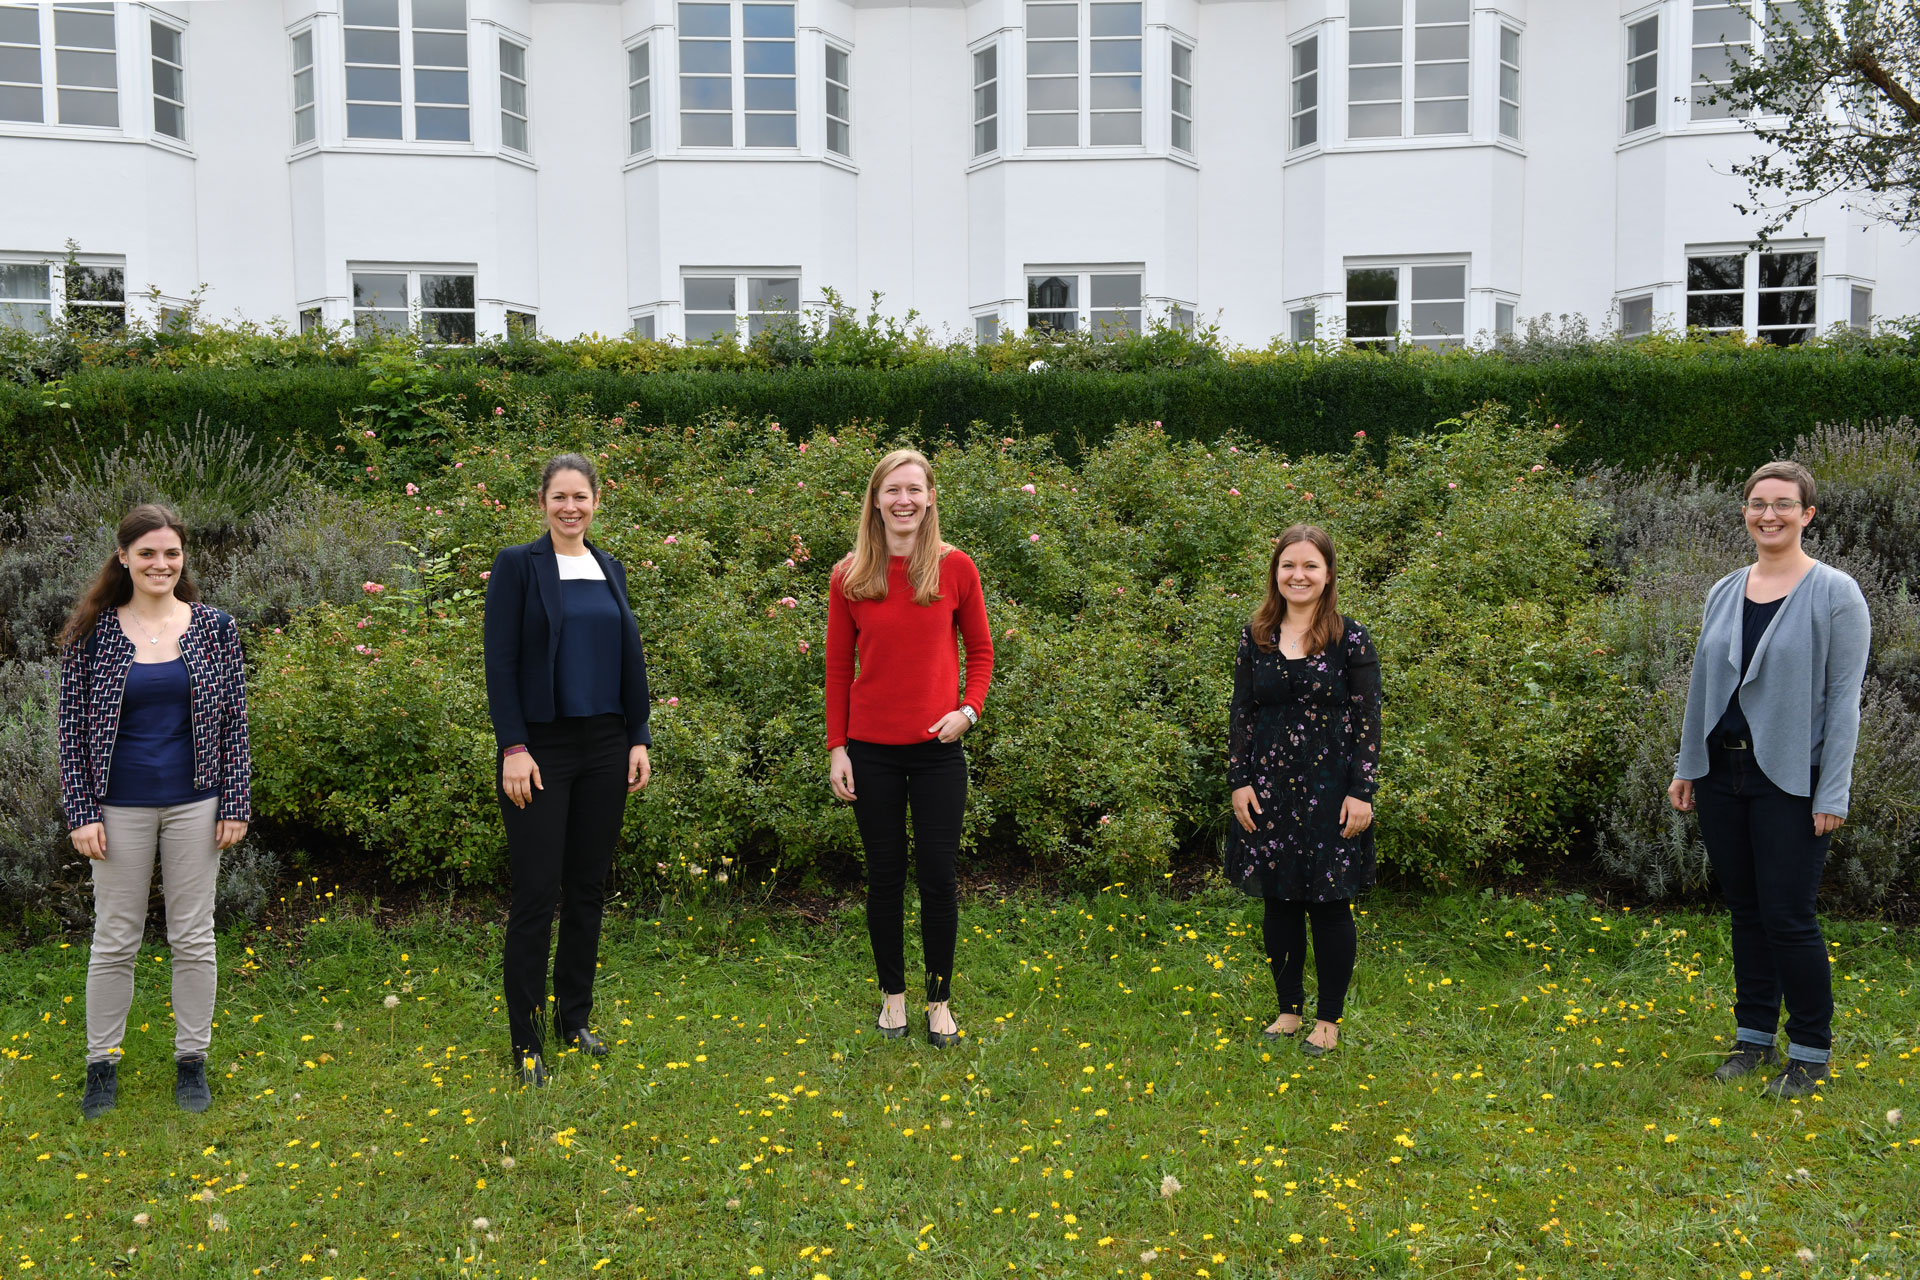 Die neuen Pastoralassistentinnen (v.l.): Ruth Hoffmann, Sandra-Maria Lernbecker, Anna-Maria Weber, Simone Kast, Marie-Kathrin Zylka